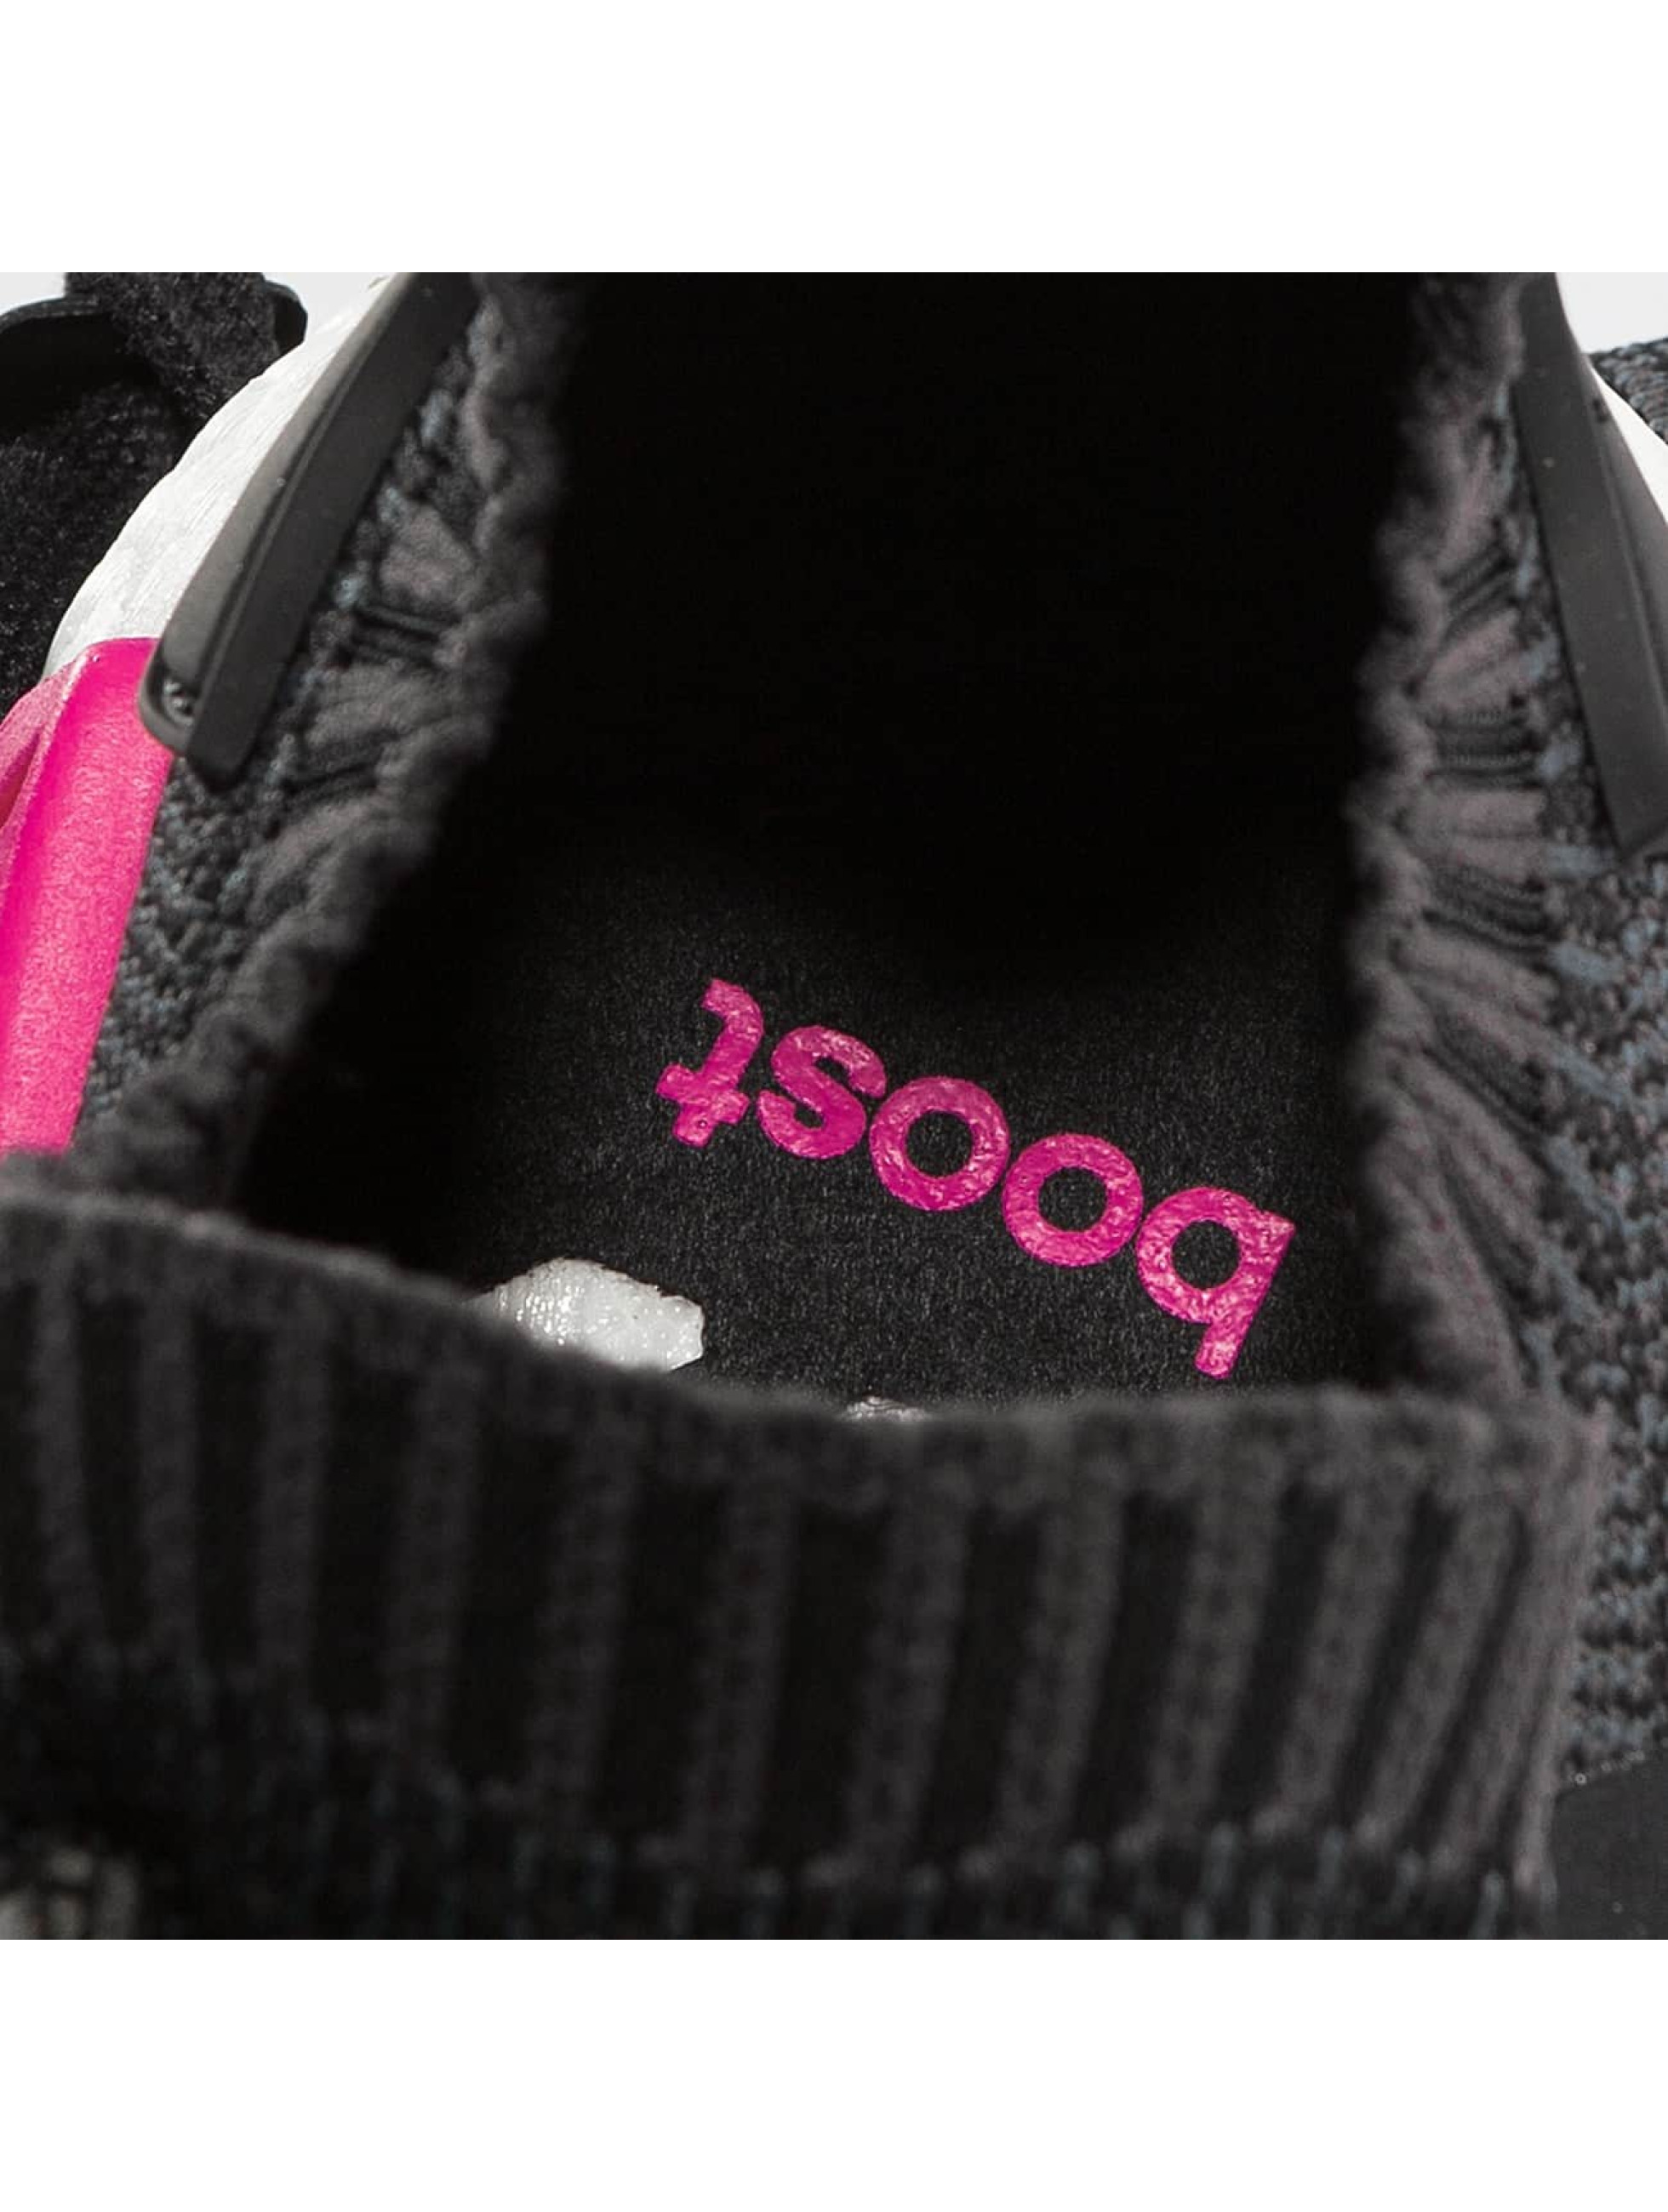 adidas Sneakers NMD R1 Primeknit èierna